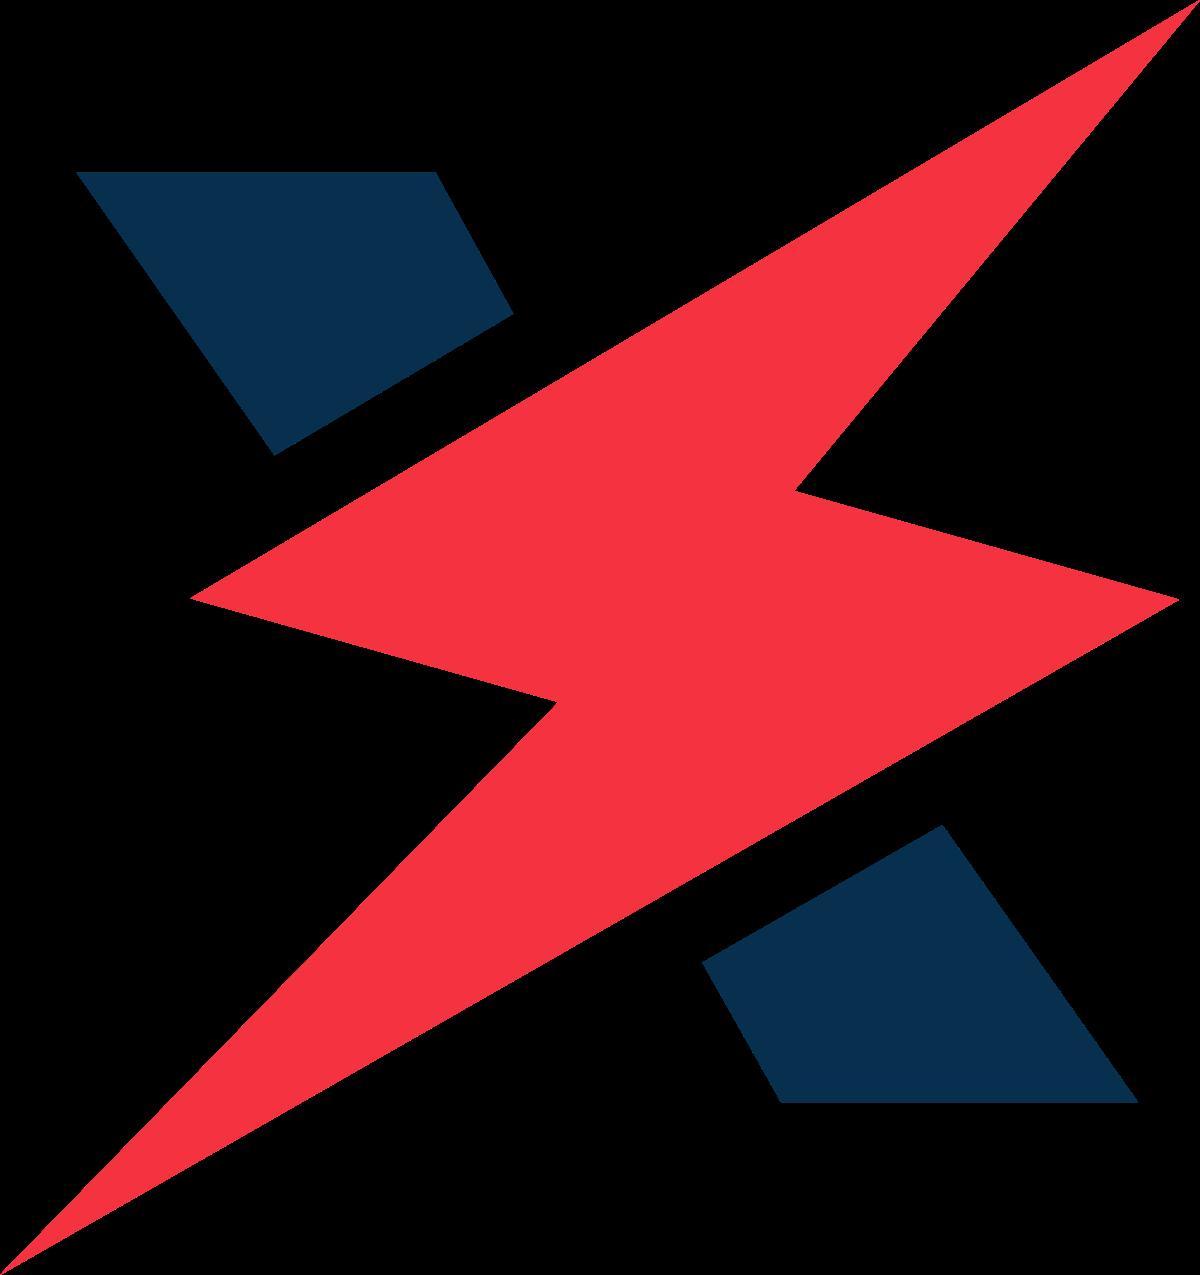 Dexecure company logo